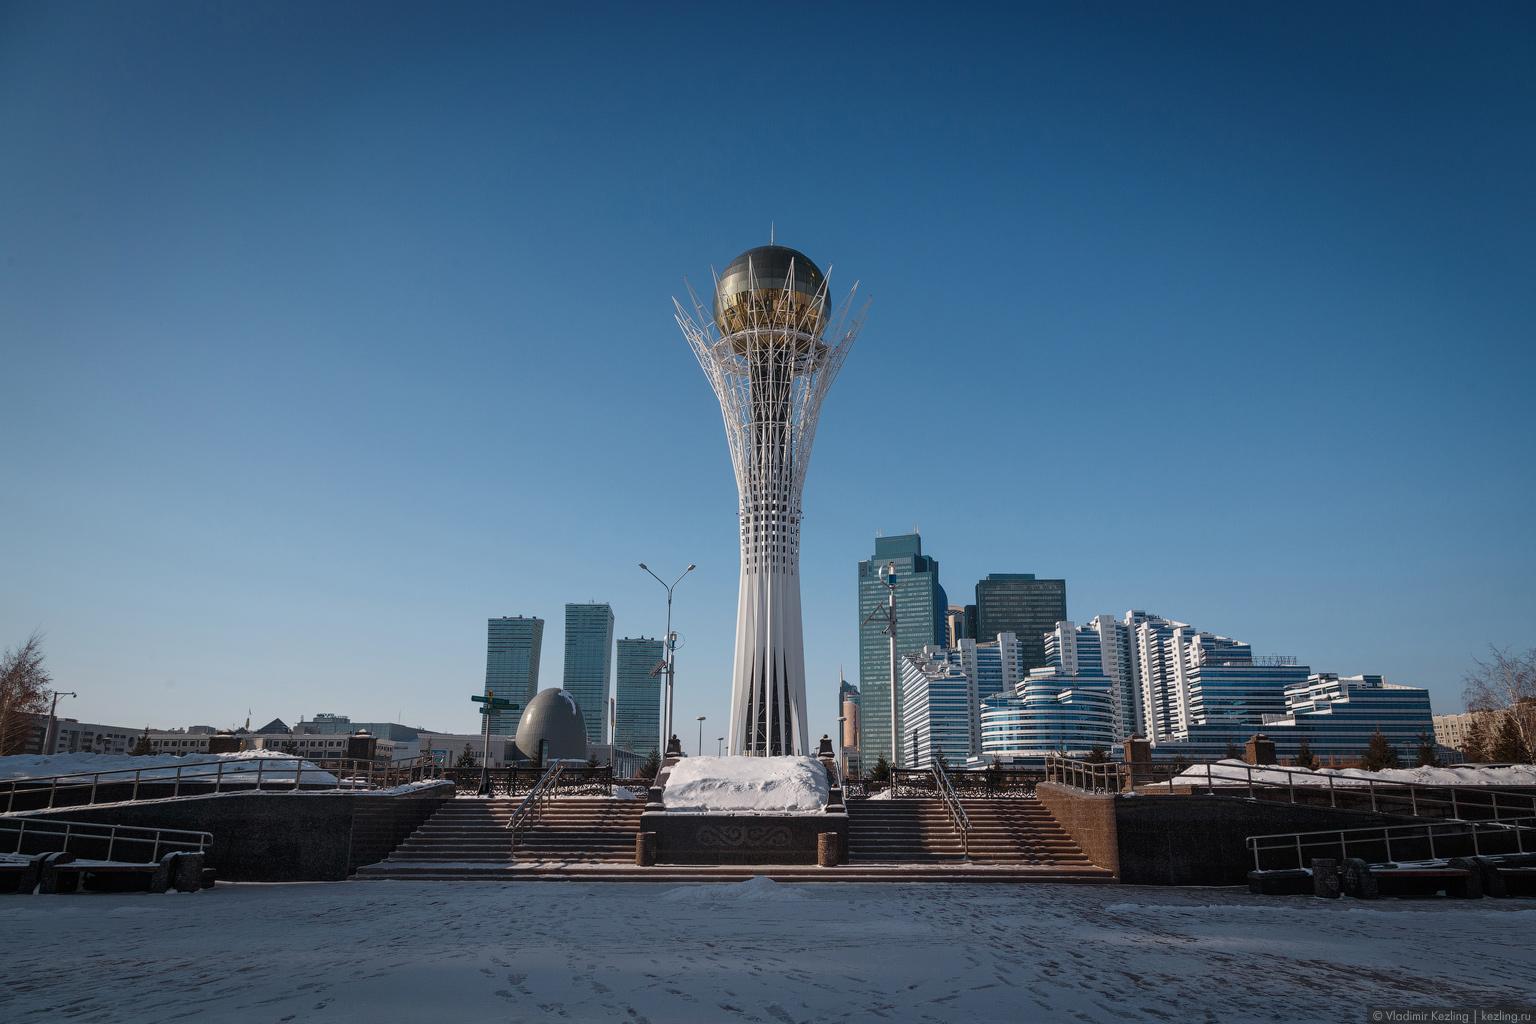 #IRFMR. Индийский этап. Пролог. Астана — противоречивая столица Казахстана